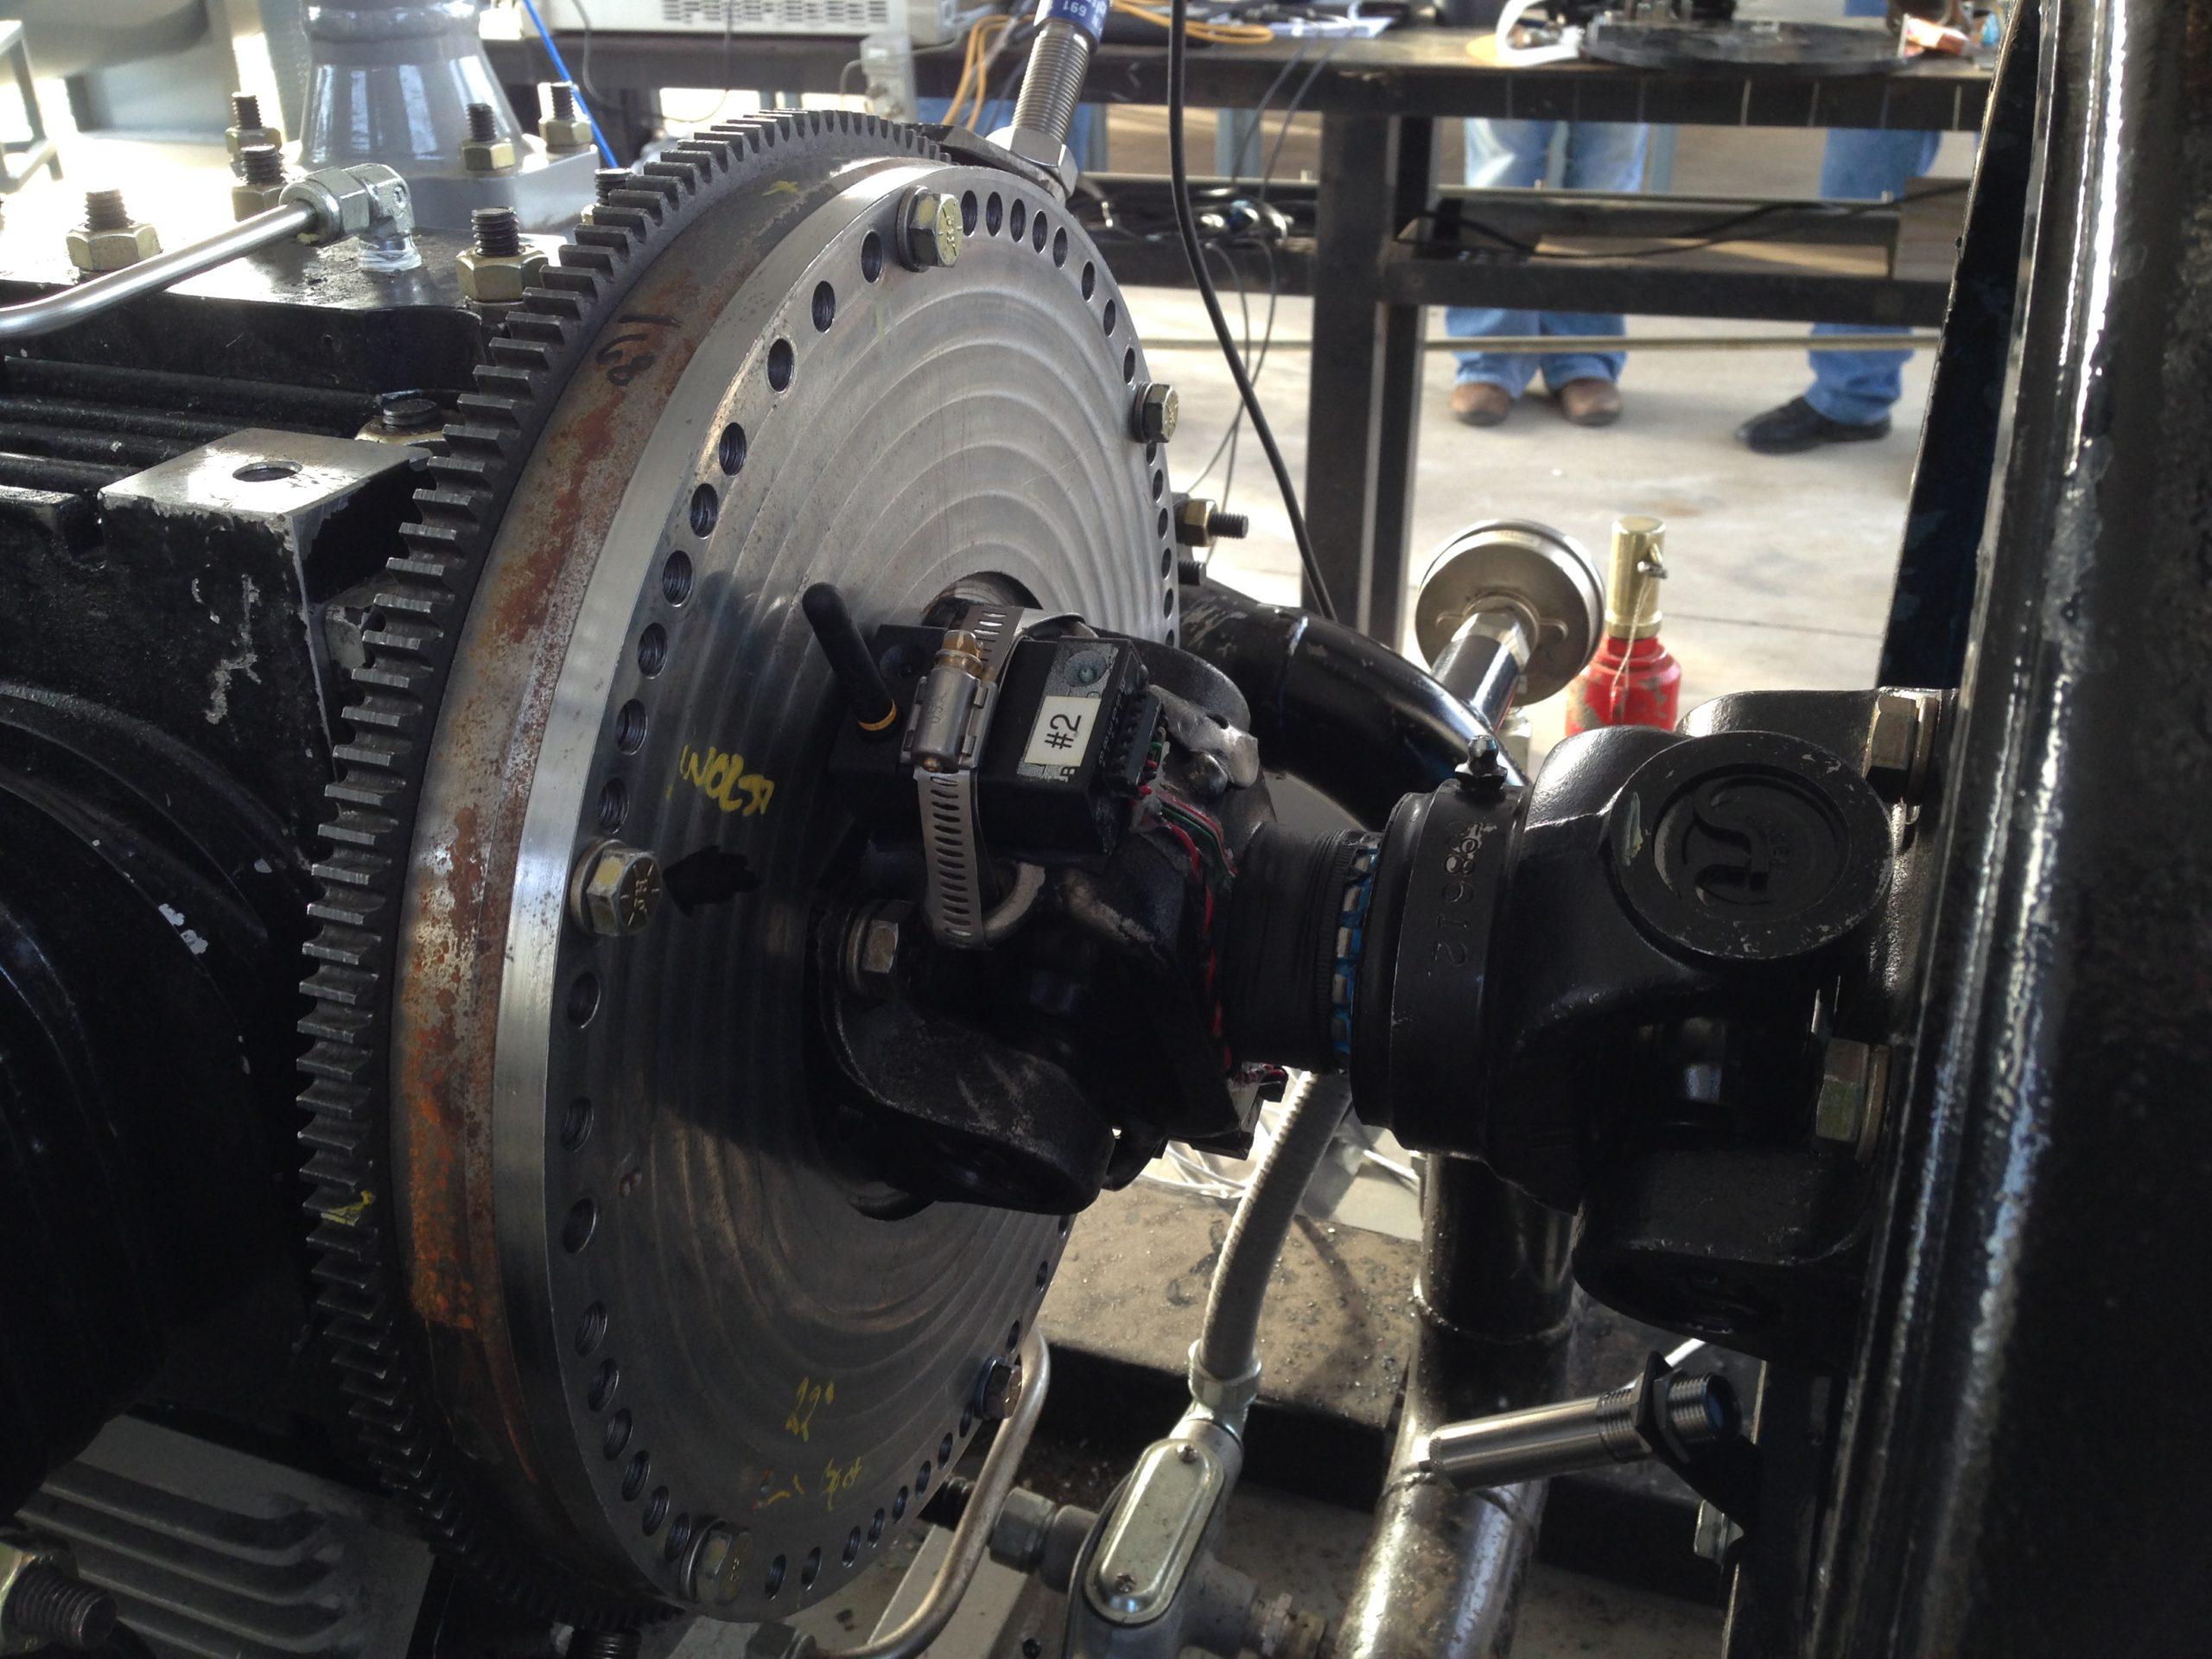 TT10K Telemetry on Reciprocating Compressor for Torsional Vibration Measurements